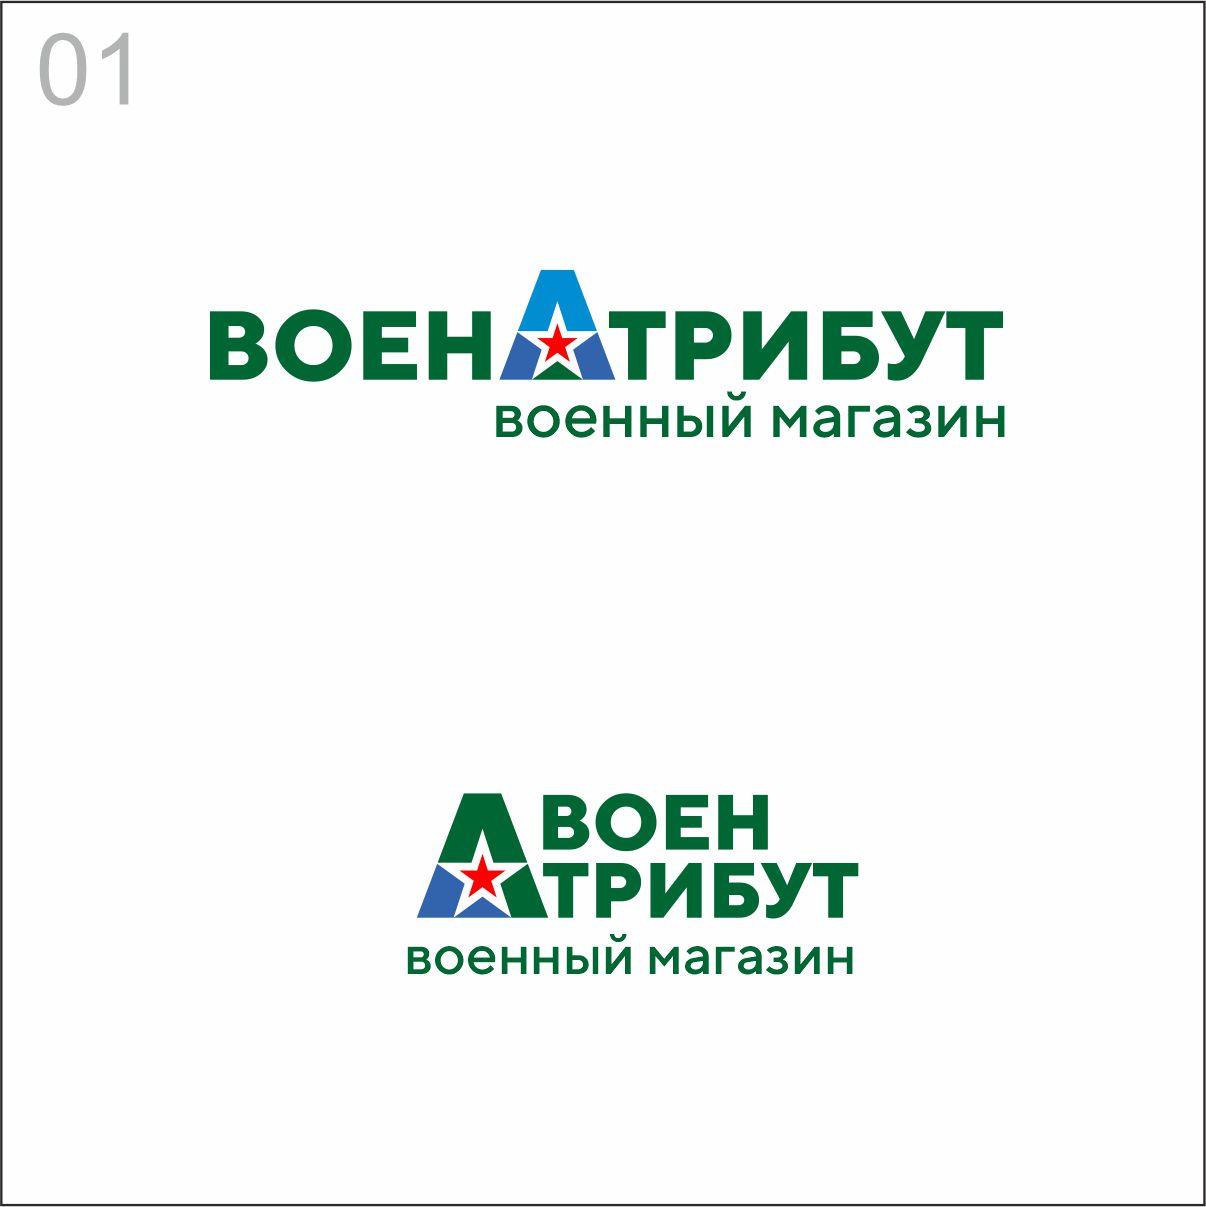 Разработка логотипа для компании военной тематики фото f_0396020b8076c37a.jpg